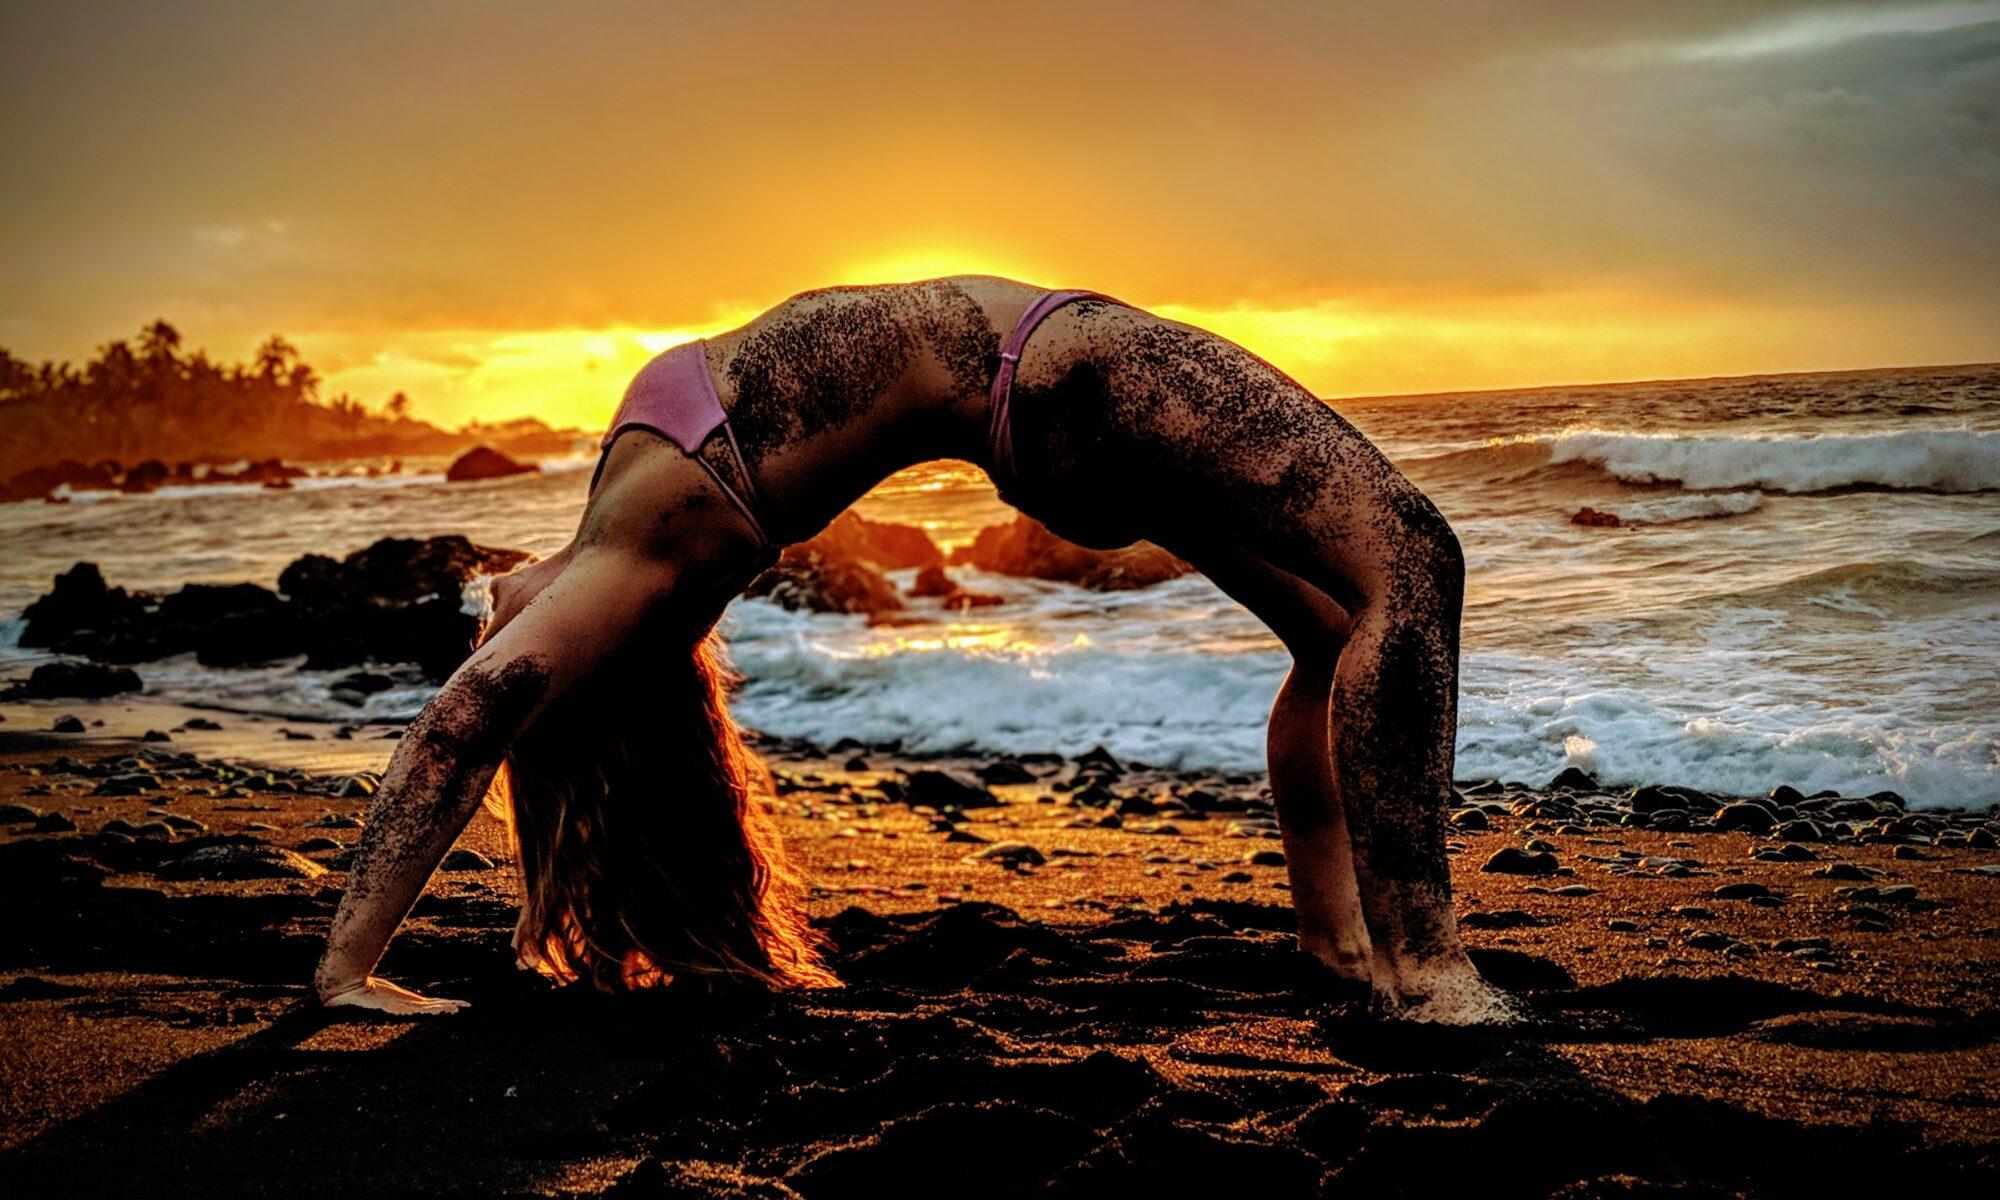 Beach yoga in Hana, Maui